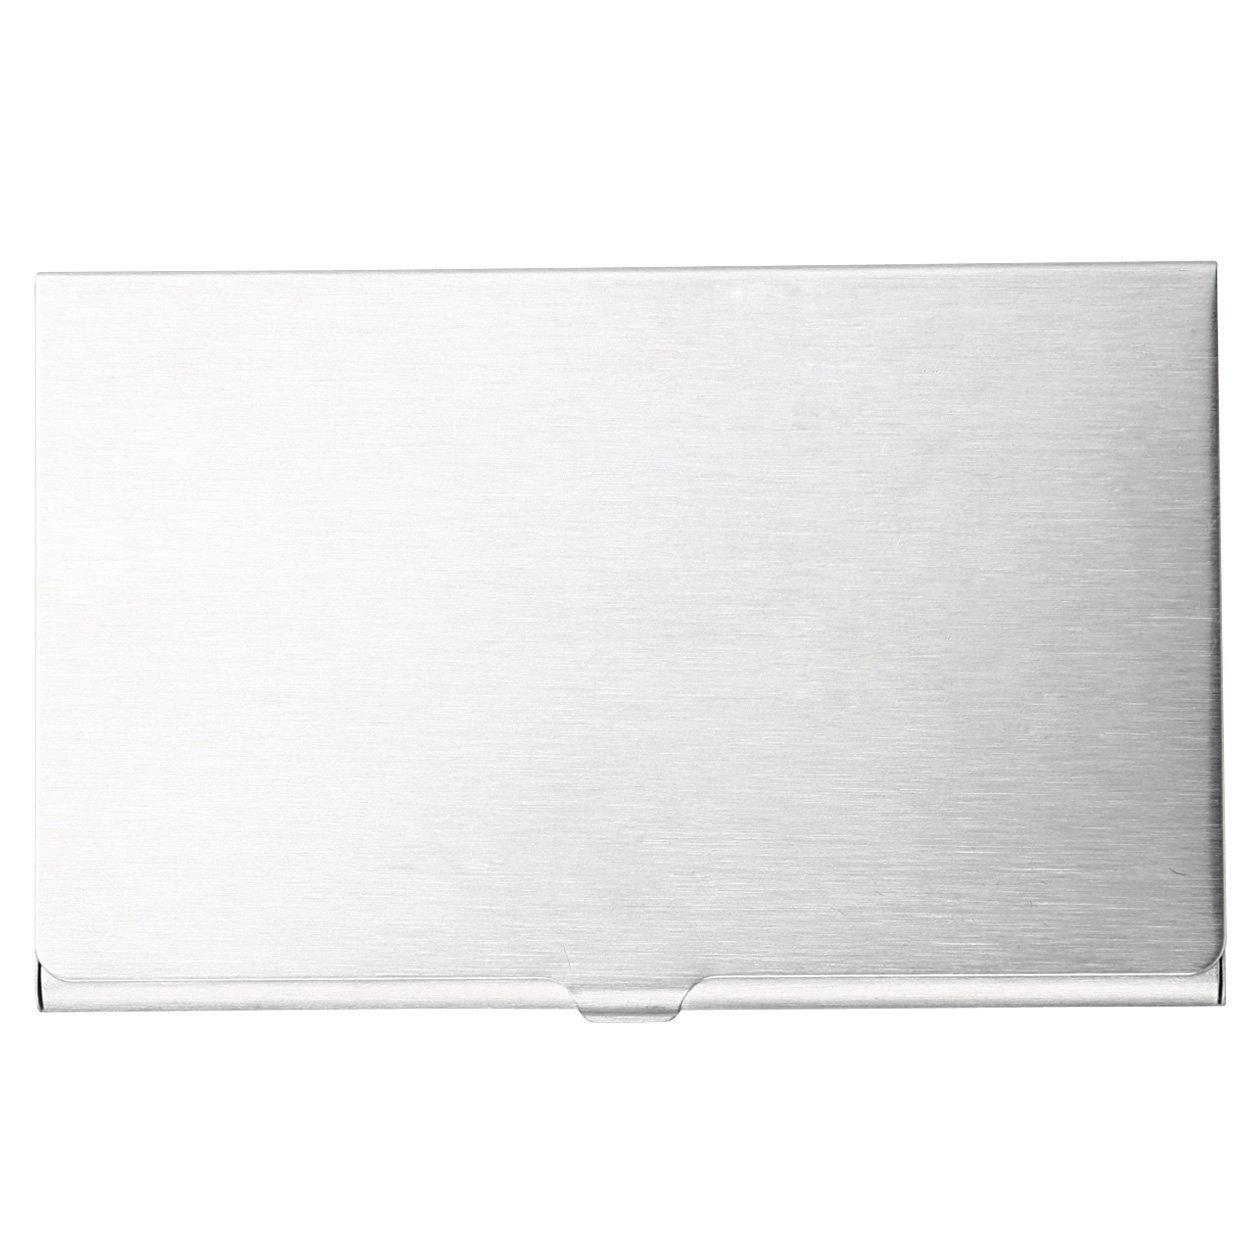 Amazon.com : Muji Aluminum Card Case - Thin : Business Card Holders ...